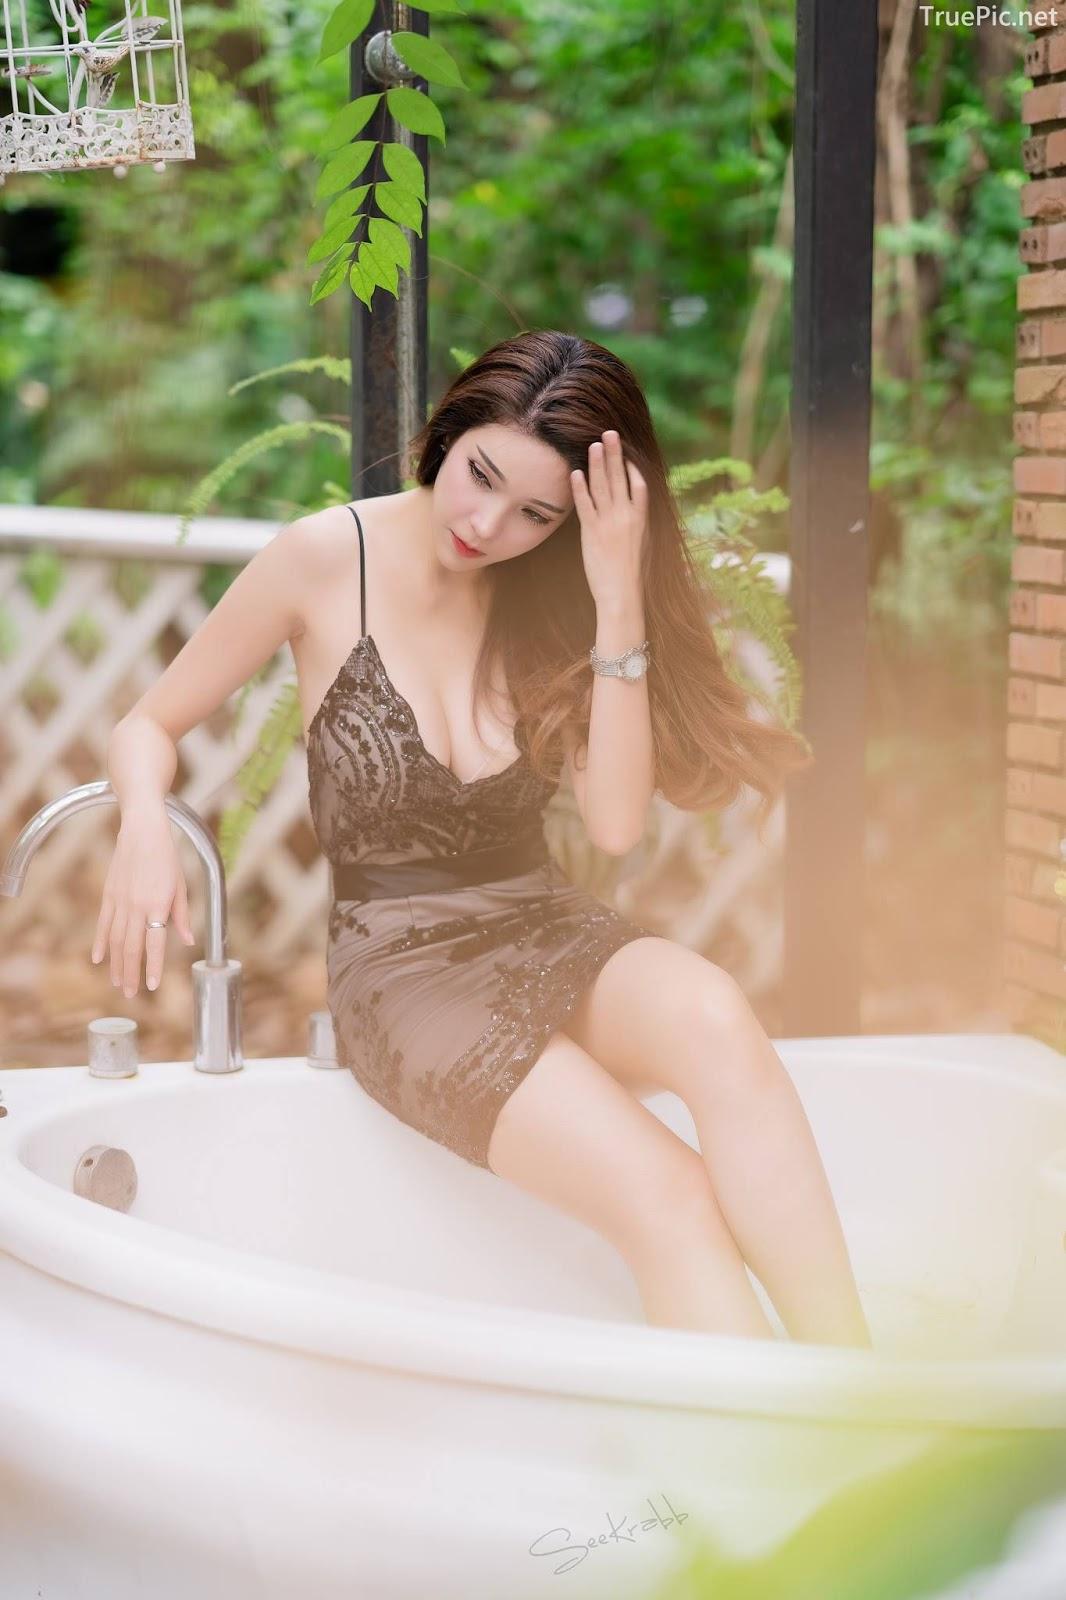 Thailand hot model - Janet Kanokwan Saesim - Black sexy garden - TruePic.net - Picture 1